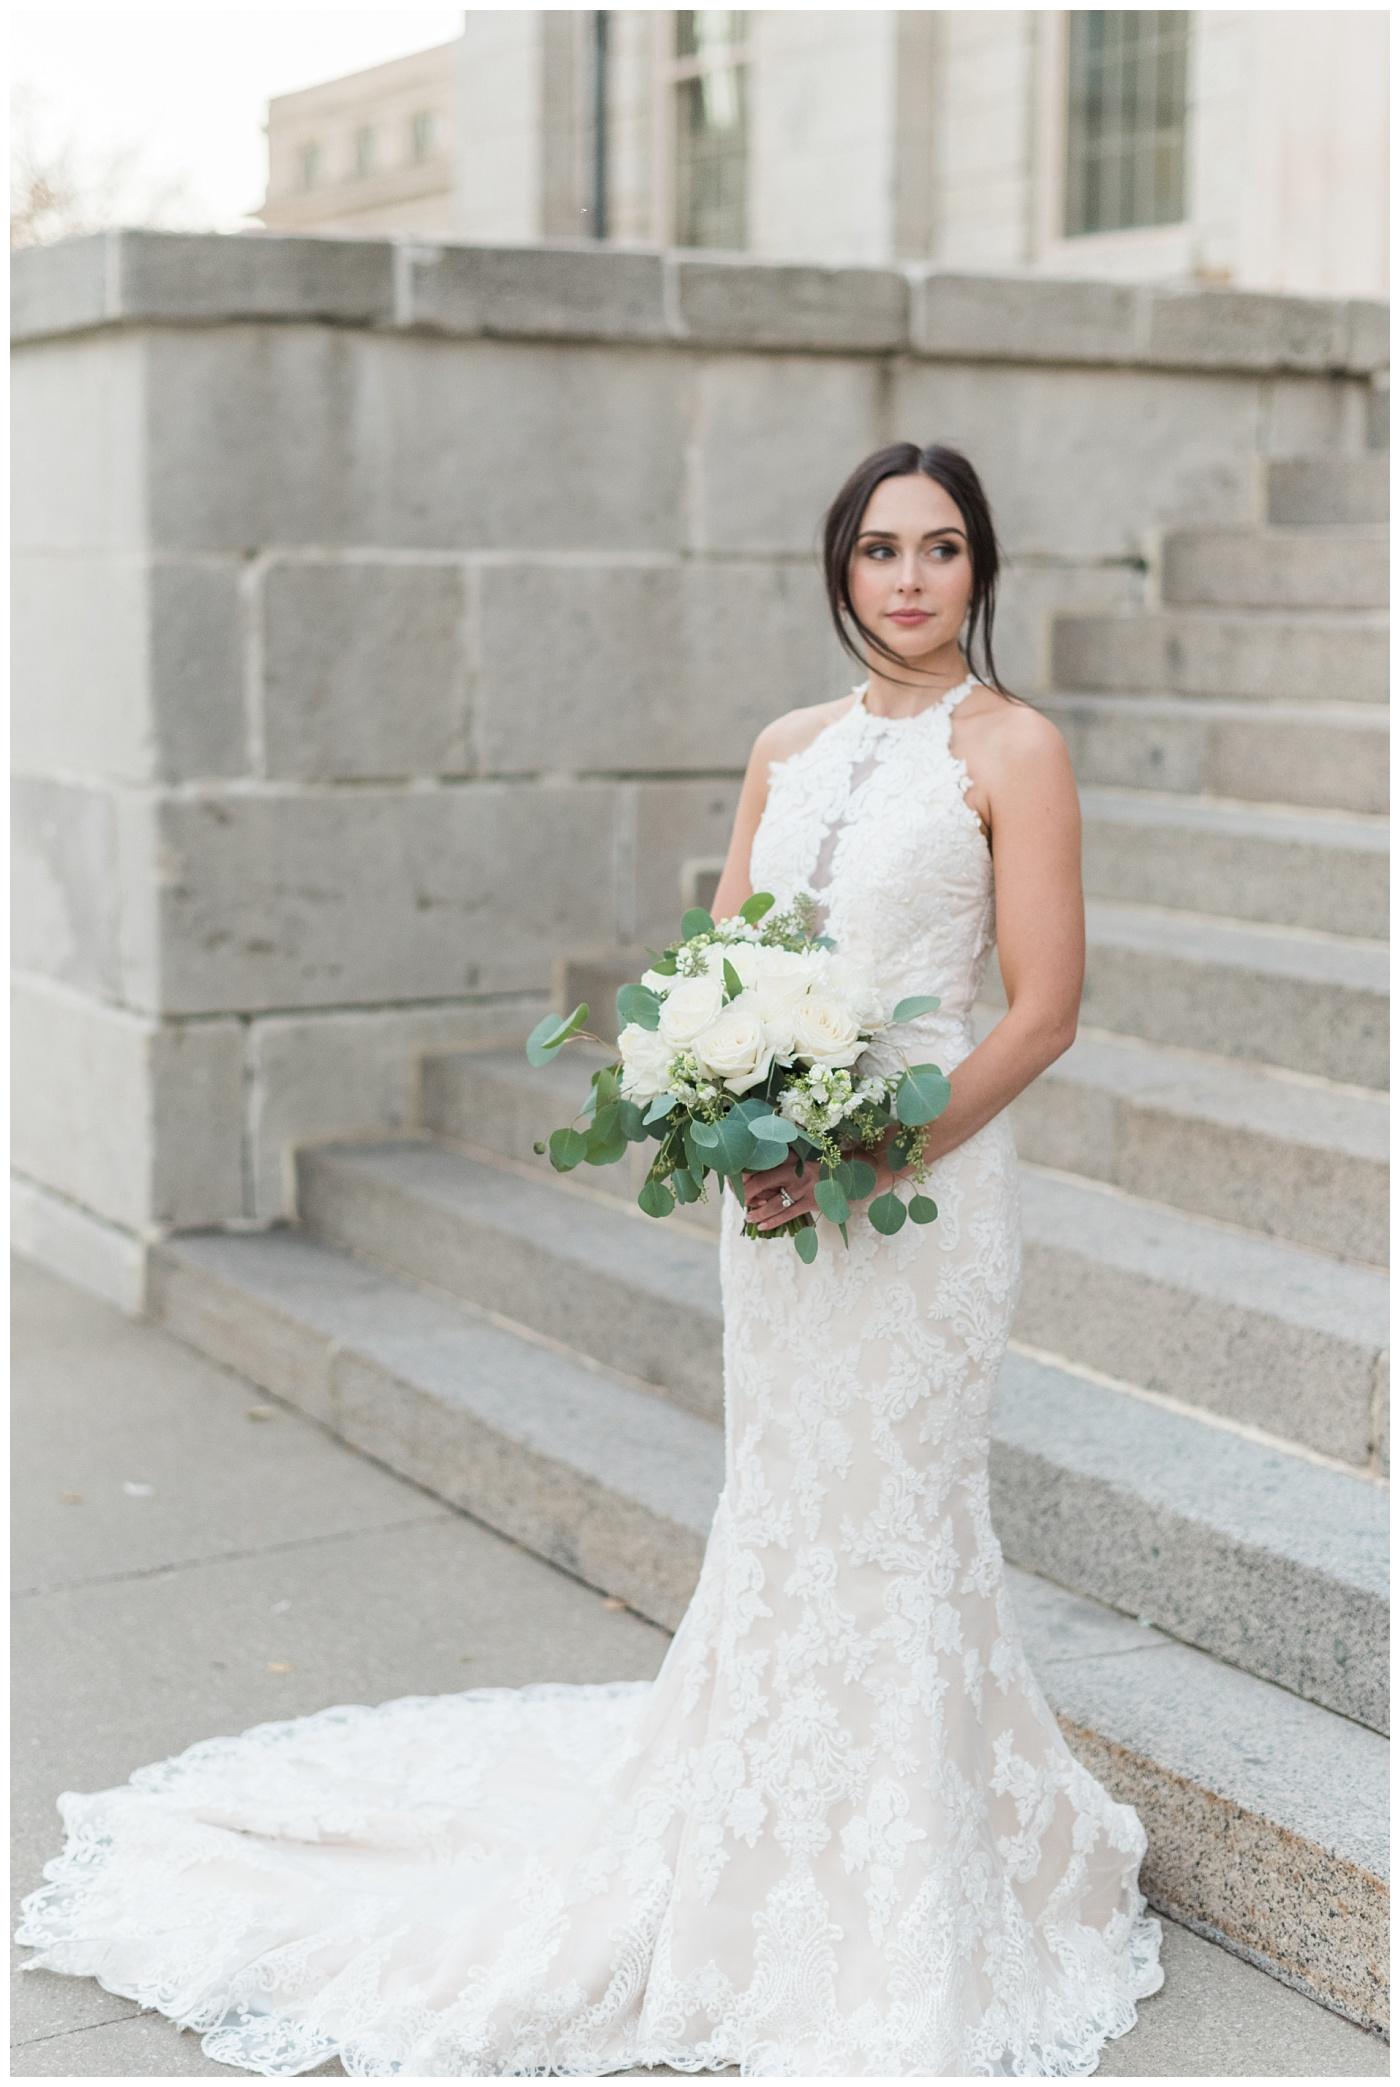 Stephanie Marie Photography Unitarian Universalist Society Church Ceremony Hotel Kirkwood Reception Cedar Rapids Iowa City Wedding Photographer Sean Madison Moore_0065.jpg